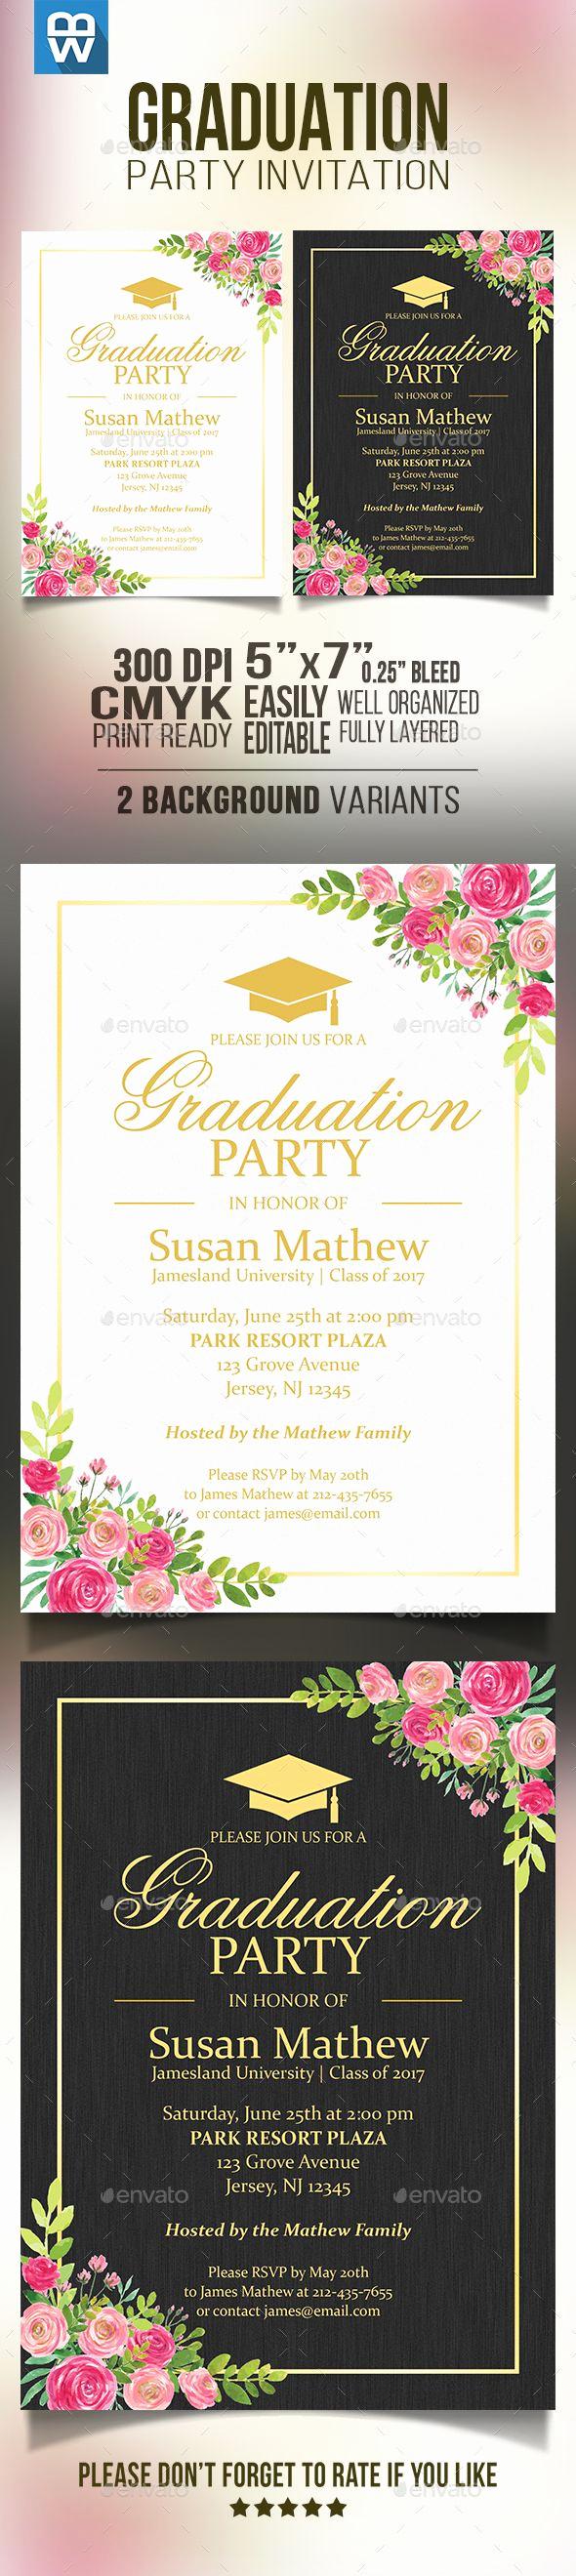 Template for Graduation Party Invitation Fresh 25 Unique Invitation Templates Ideas On Pinterest